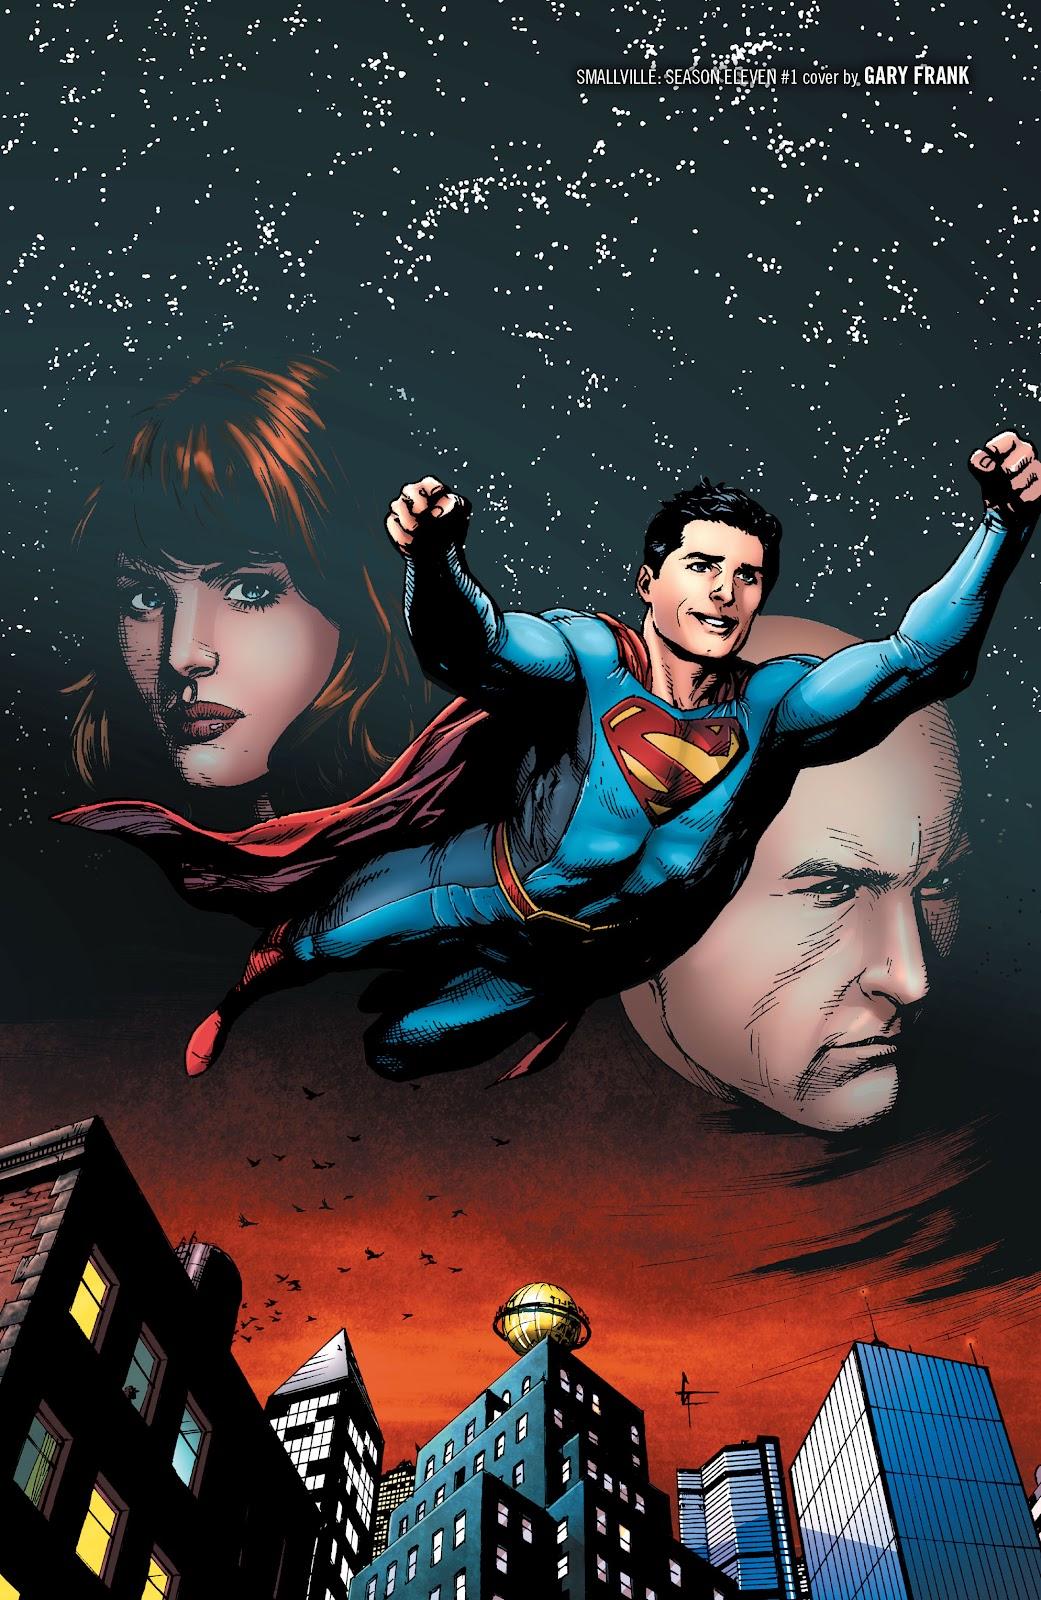 Read online Smallville Season 11 [II] comic -  Issue # TPB 1 - 5